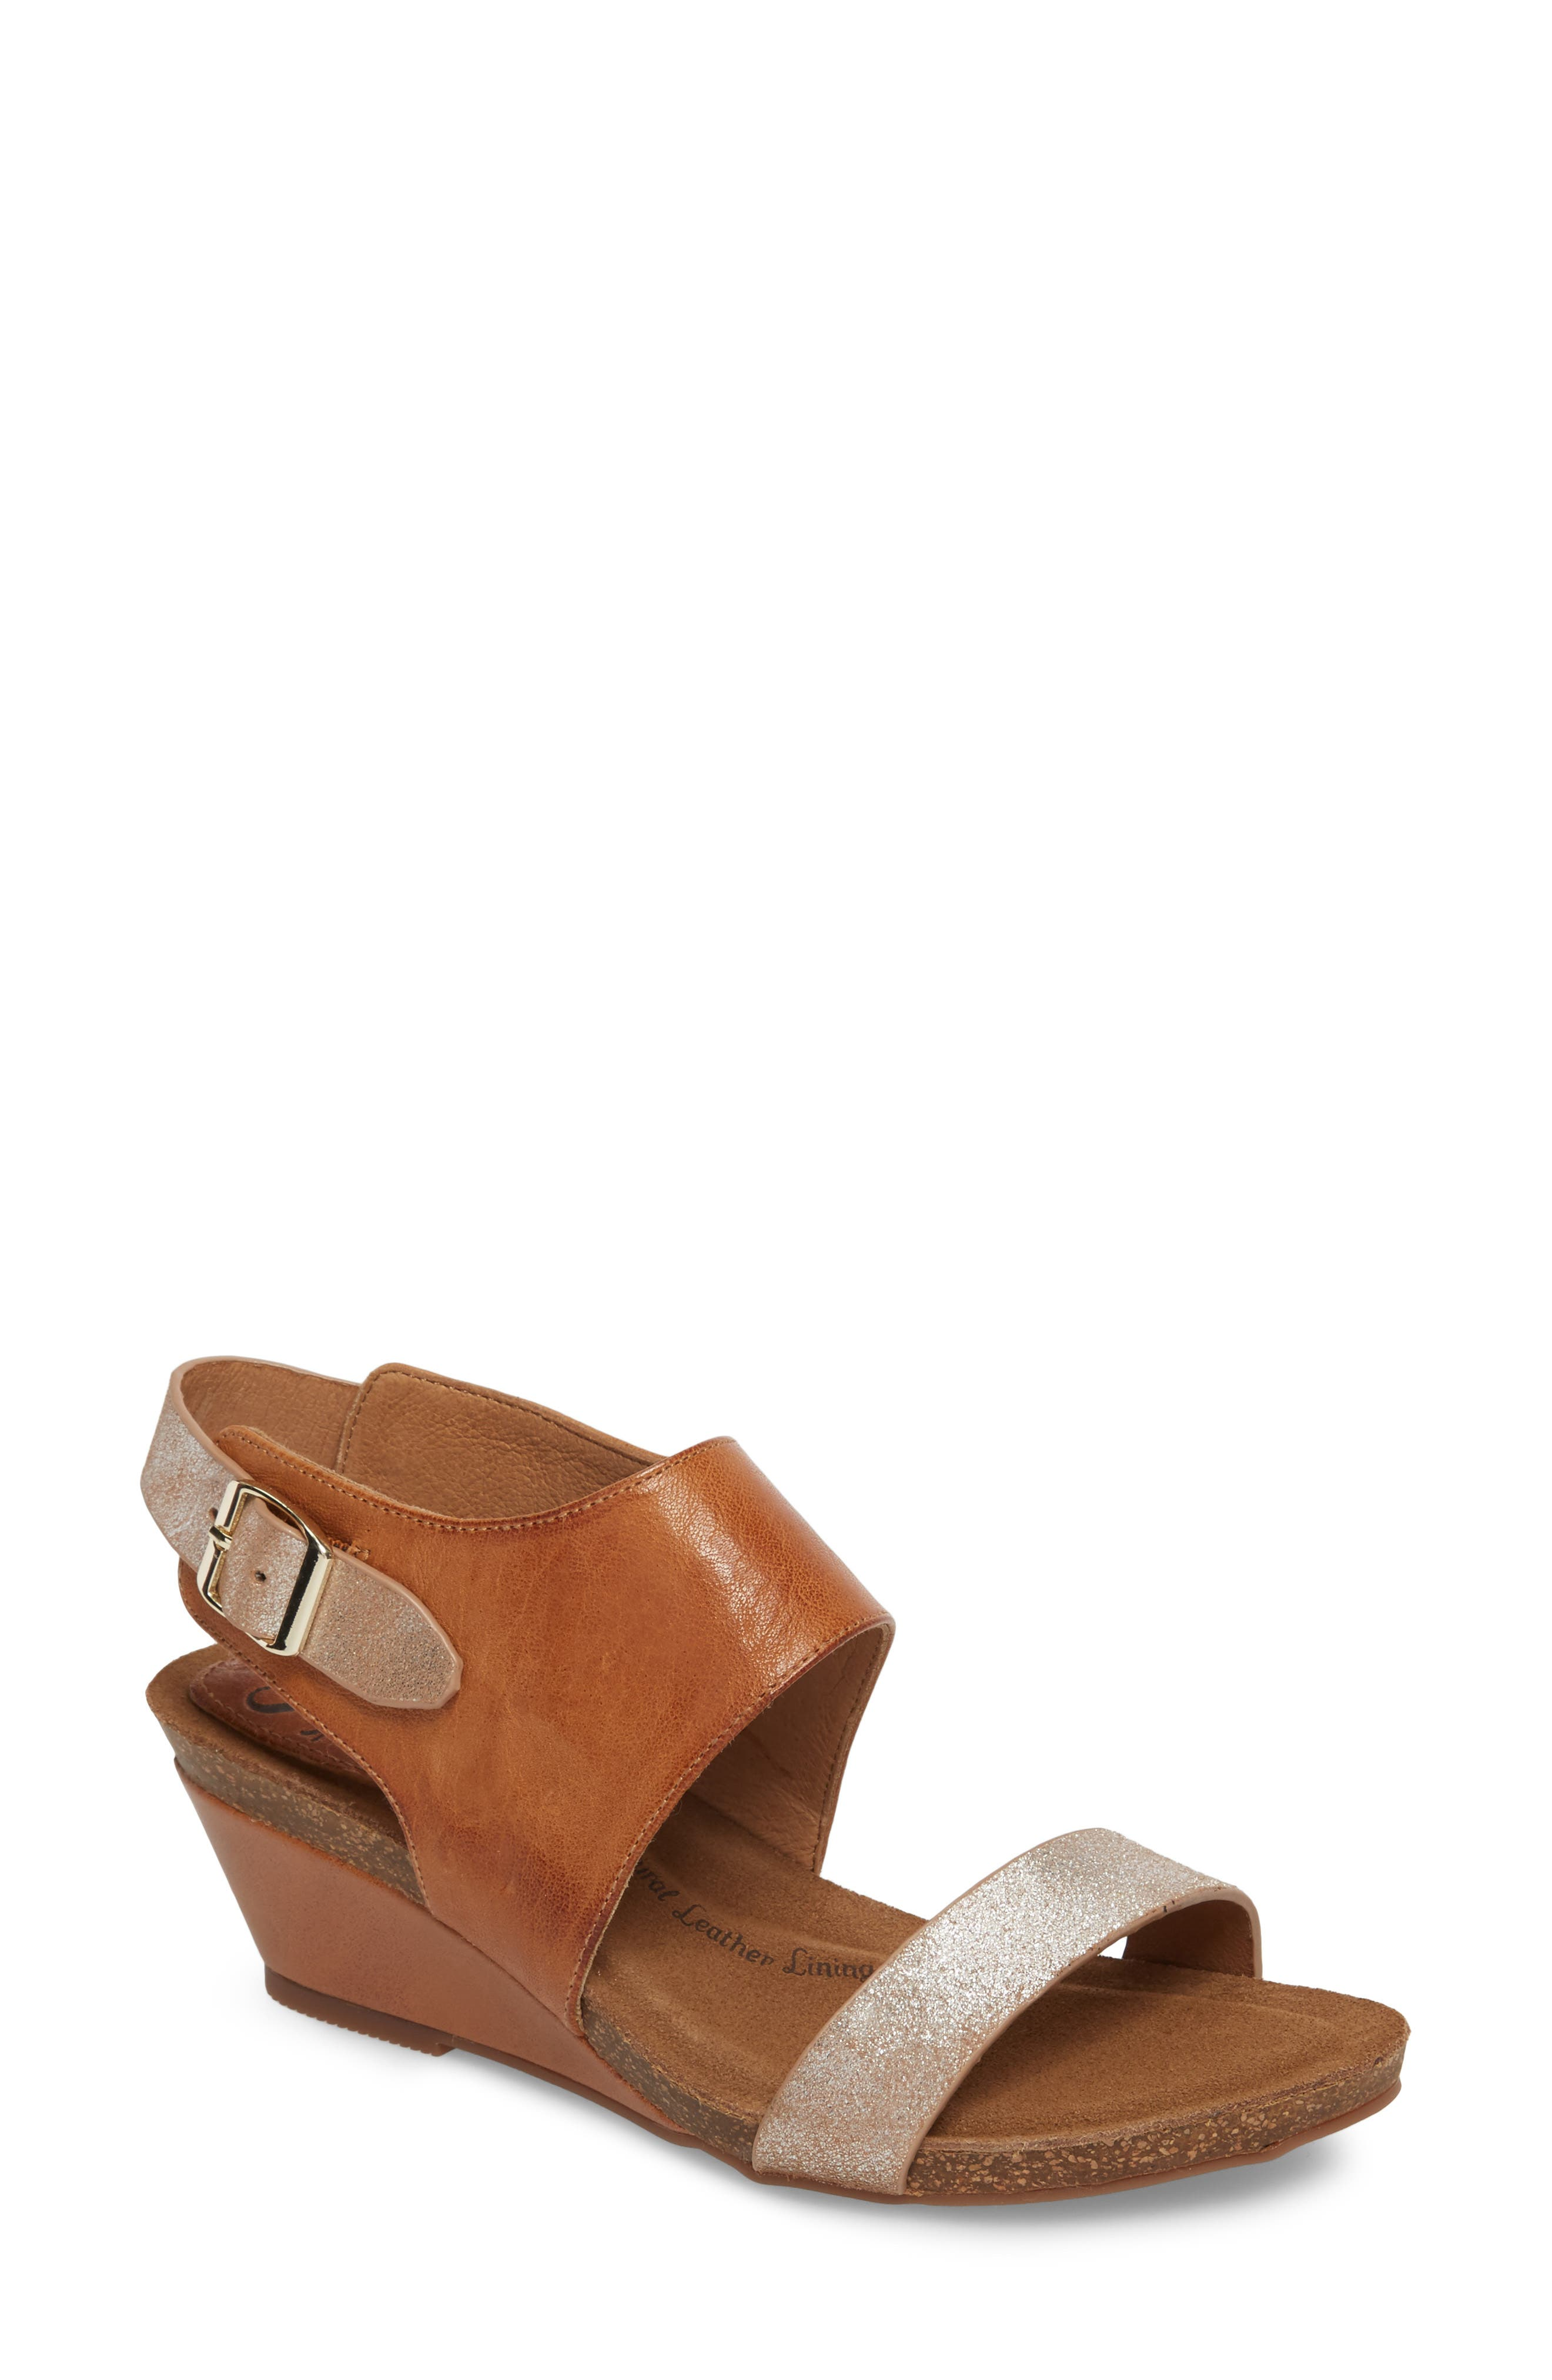 ,                             'Vanita' Leather Sandal,                             Main thumbnail 1, color,                             LUGGAGE/ SILVER LEATHER